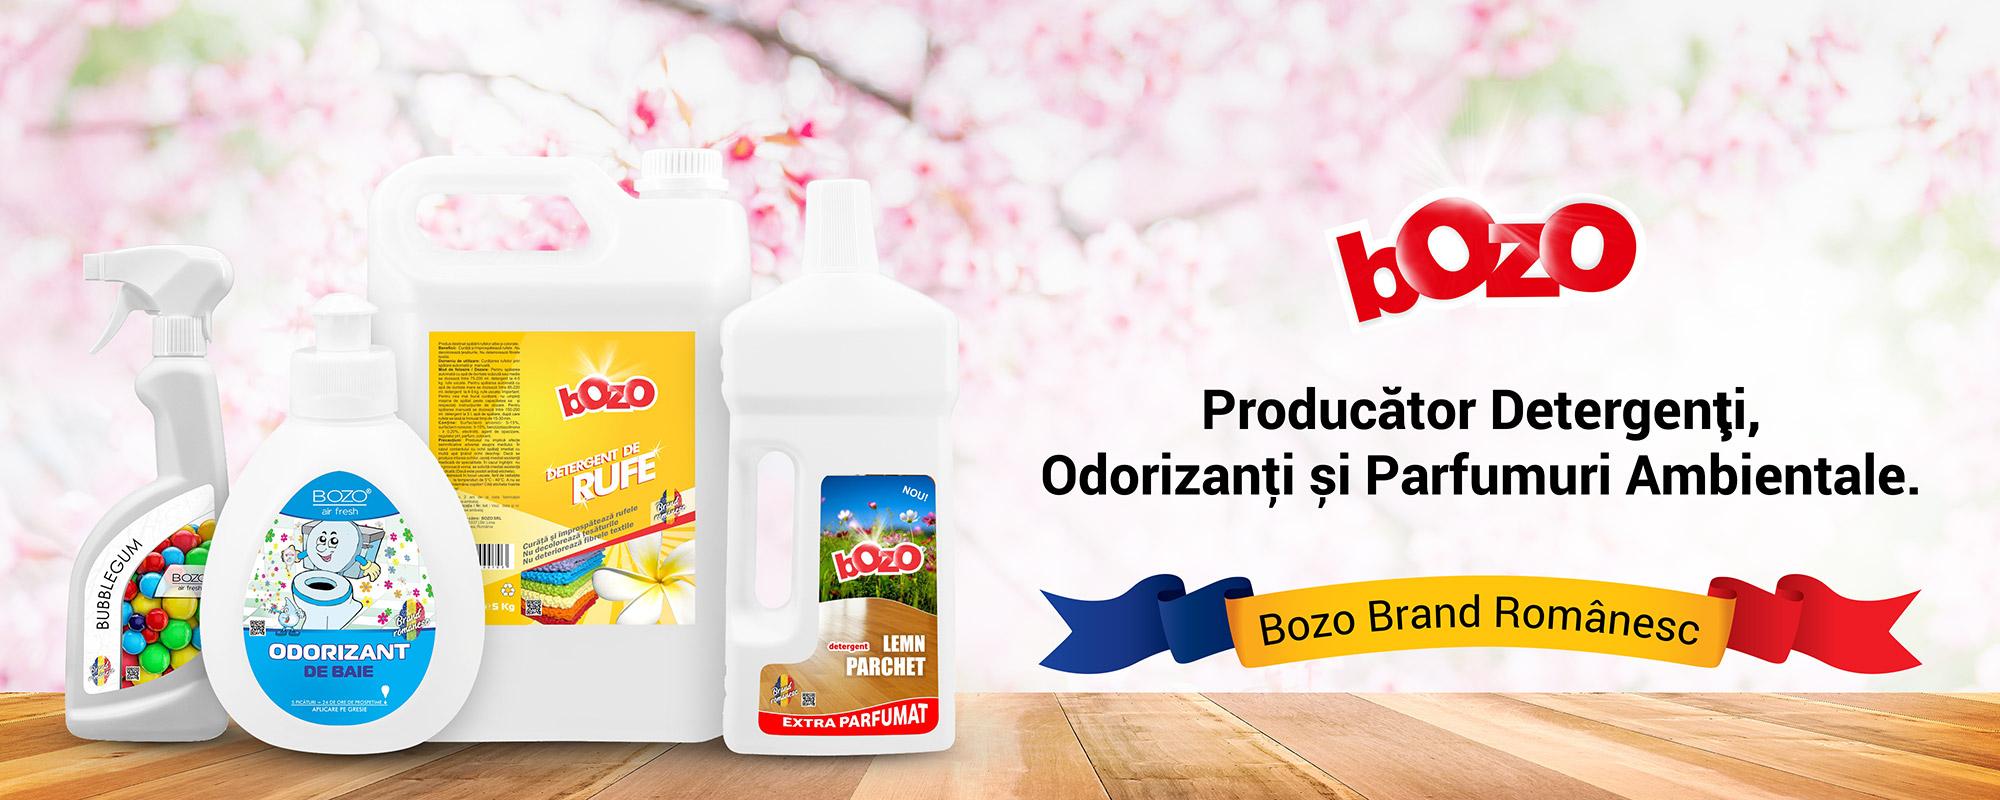 Bozo - Producator detergenti, parfumuri ambientale, odorizanti si produse intretinere auto.